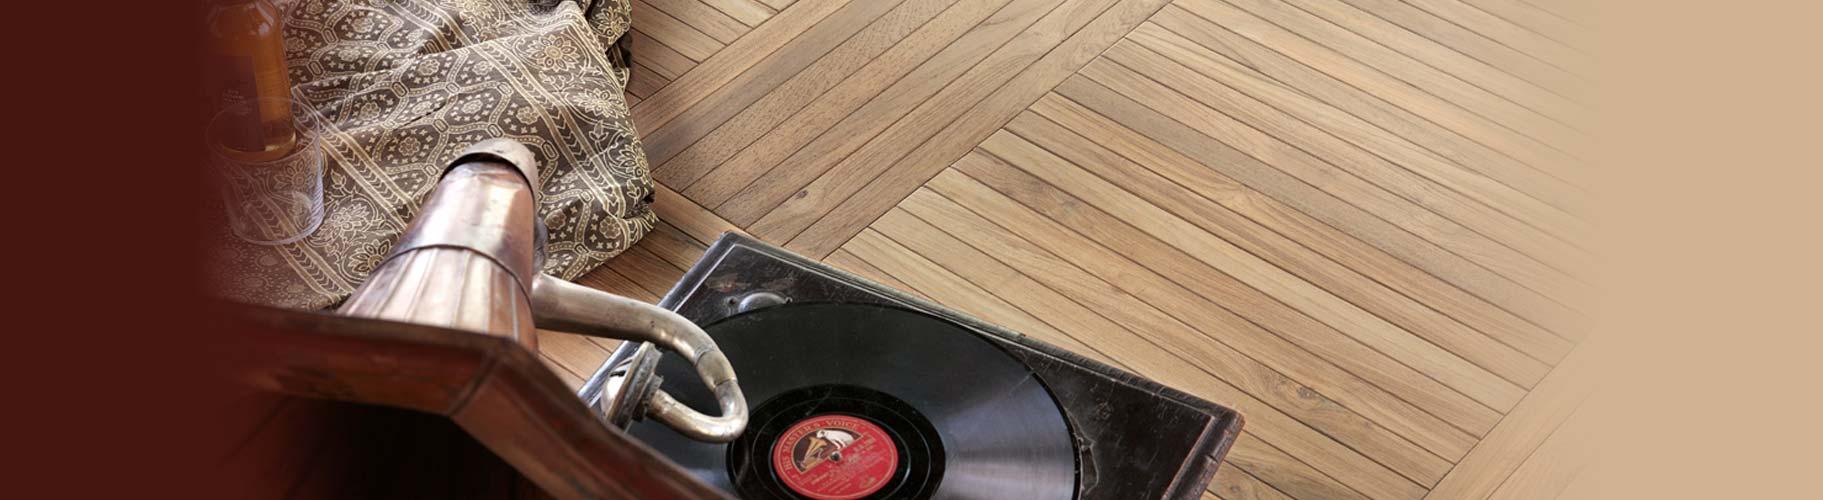 deparquet-gramofono-500